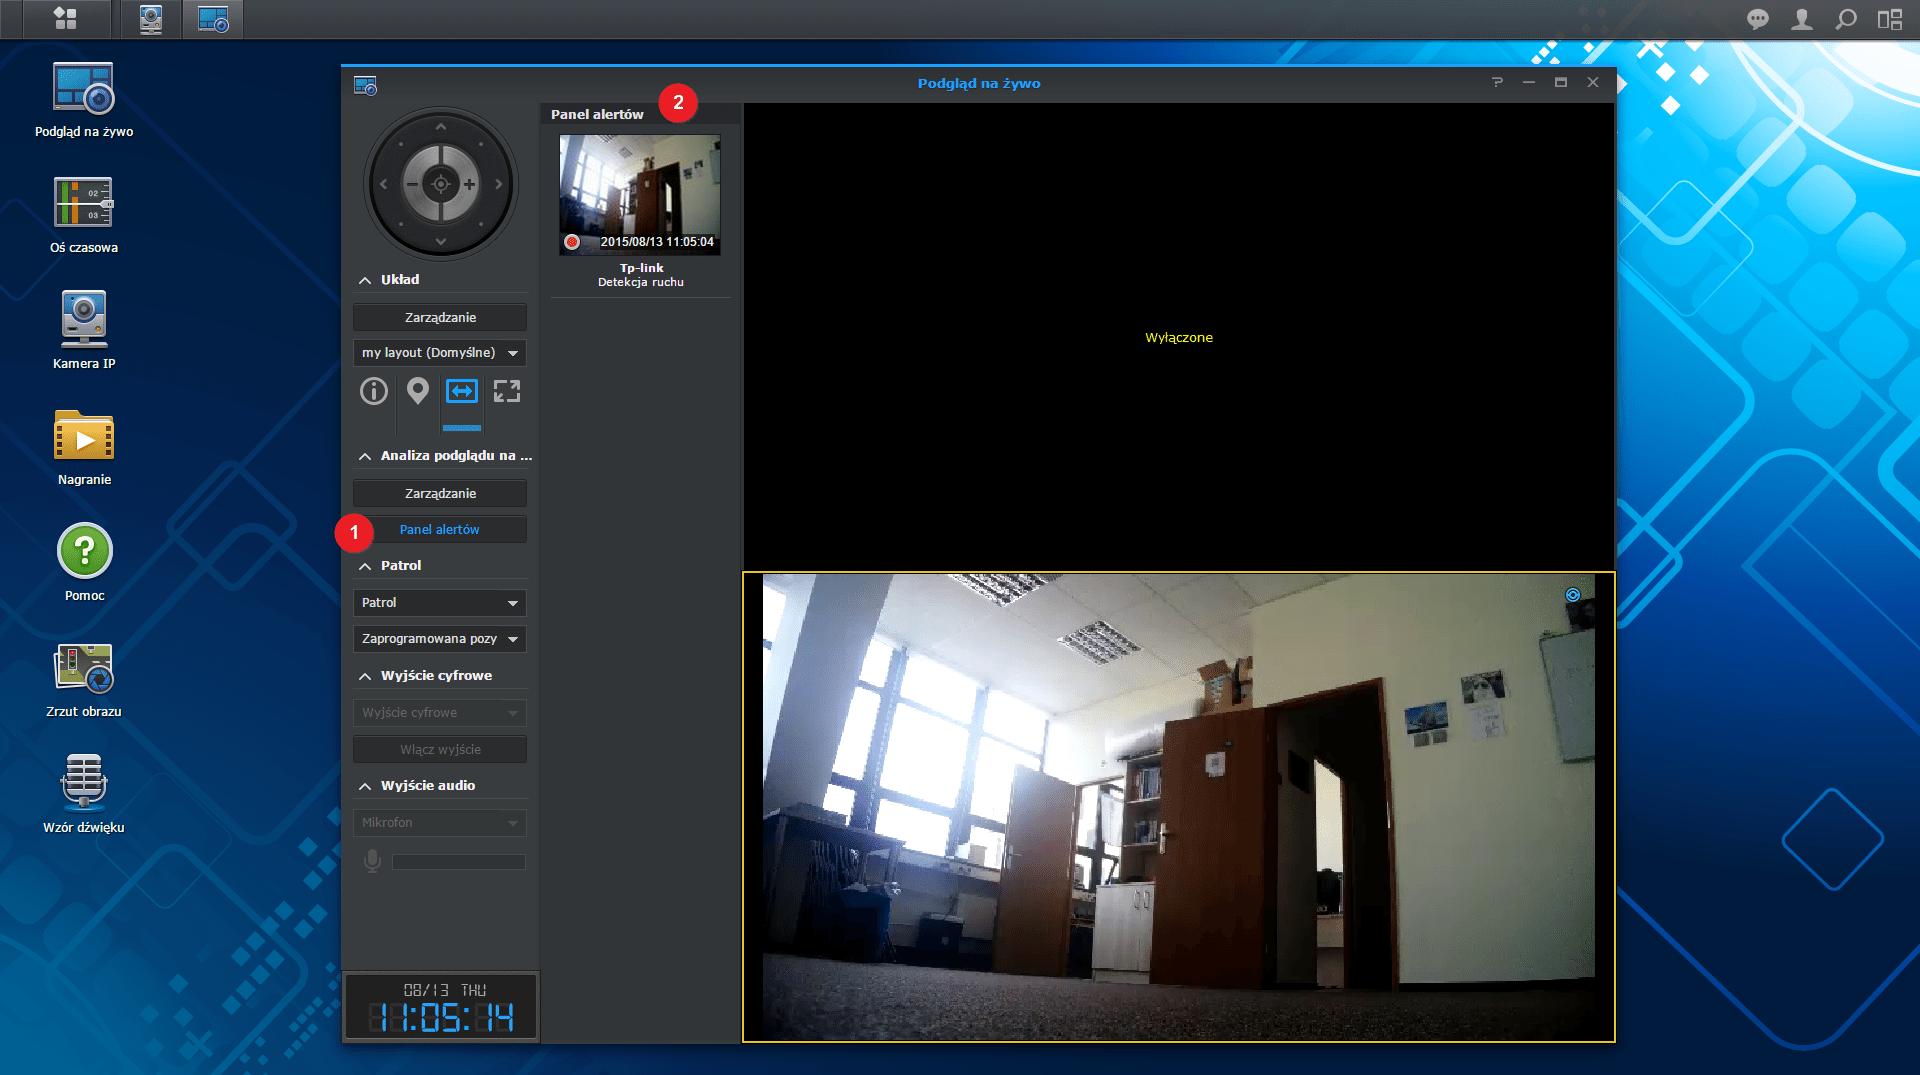 Surveillance Station